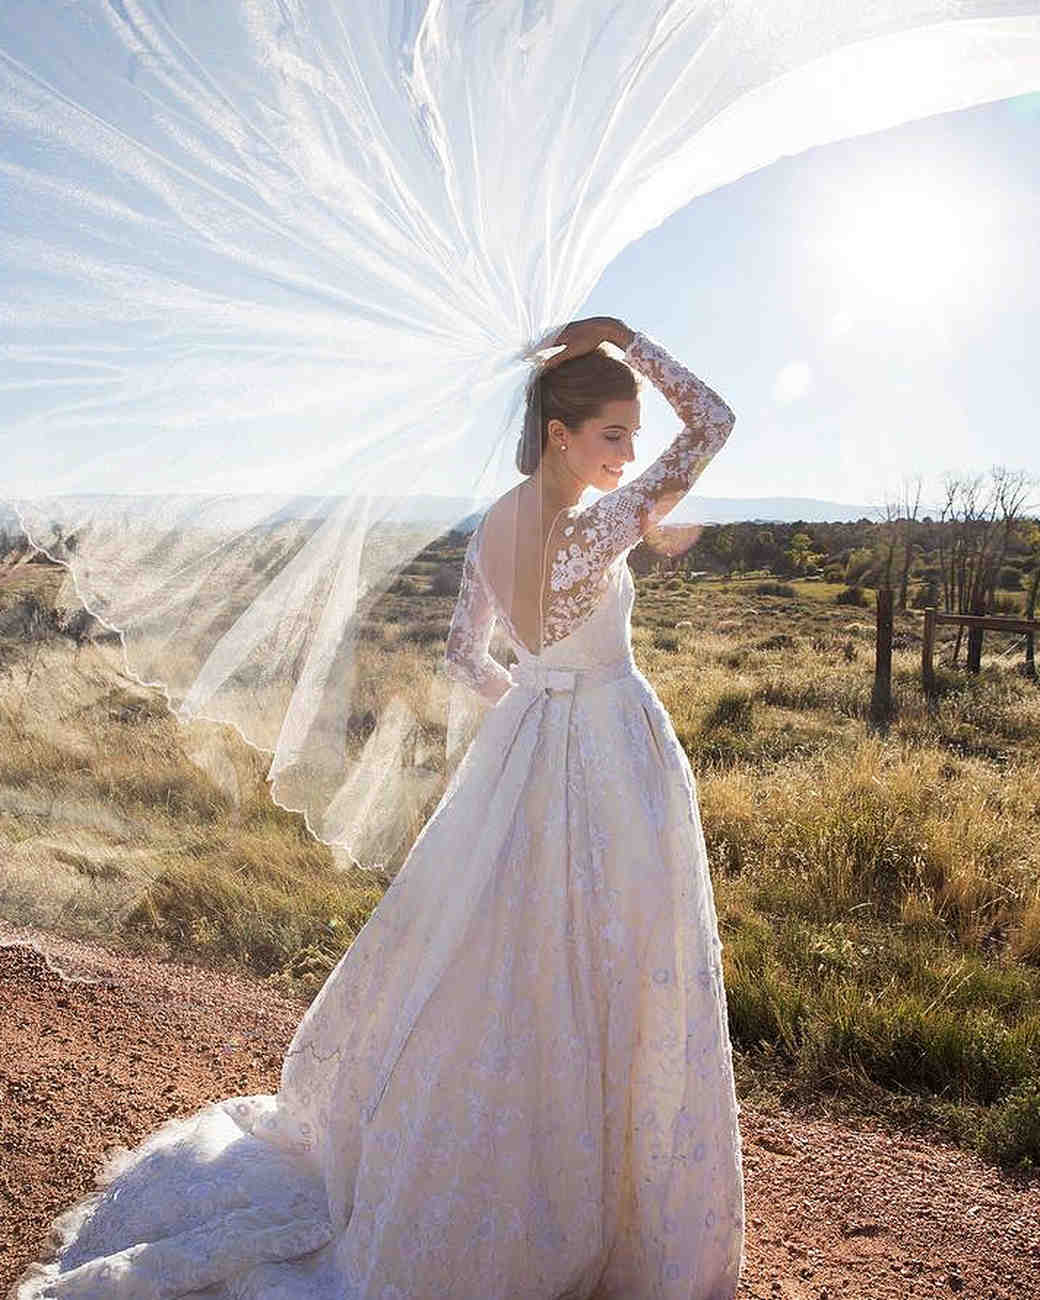 allison-williams-wedding-veil-0716.jpg